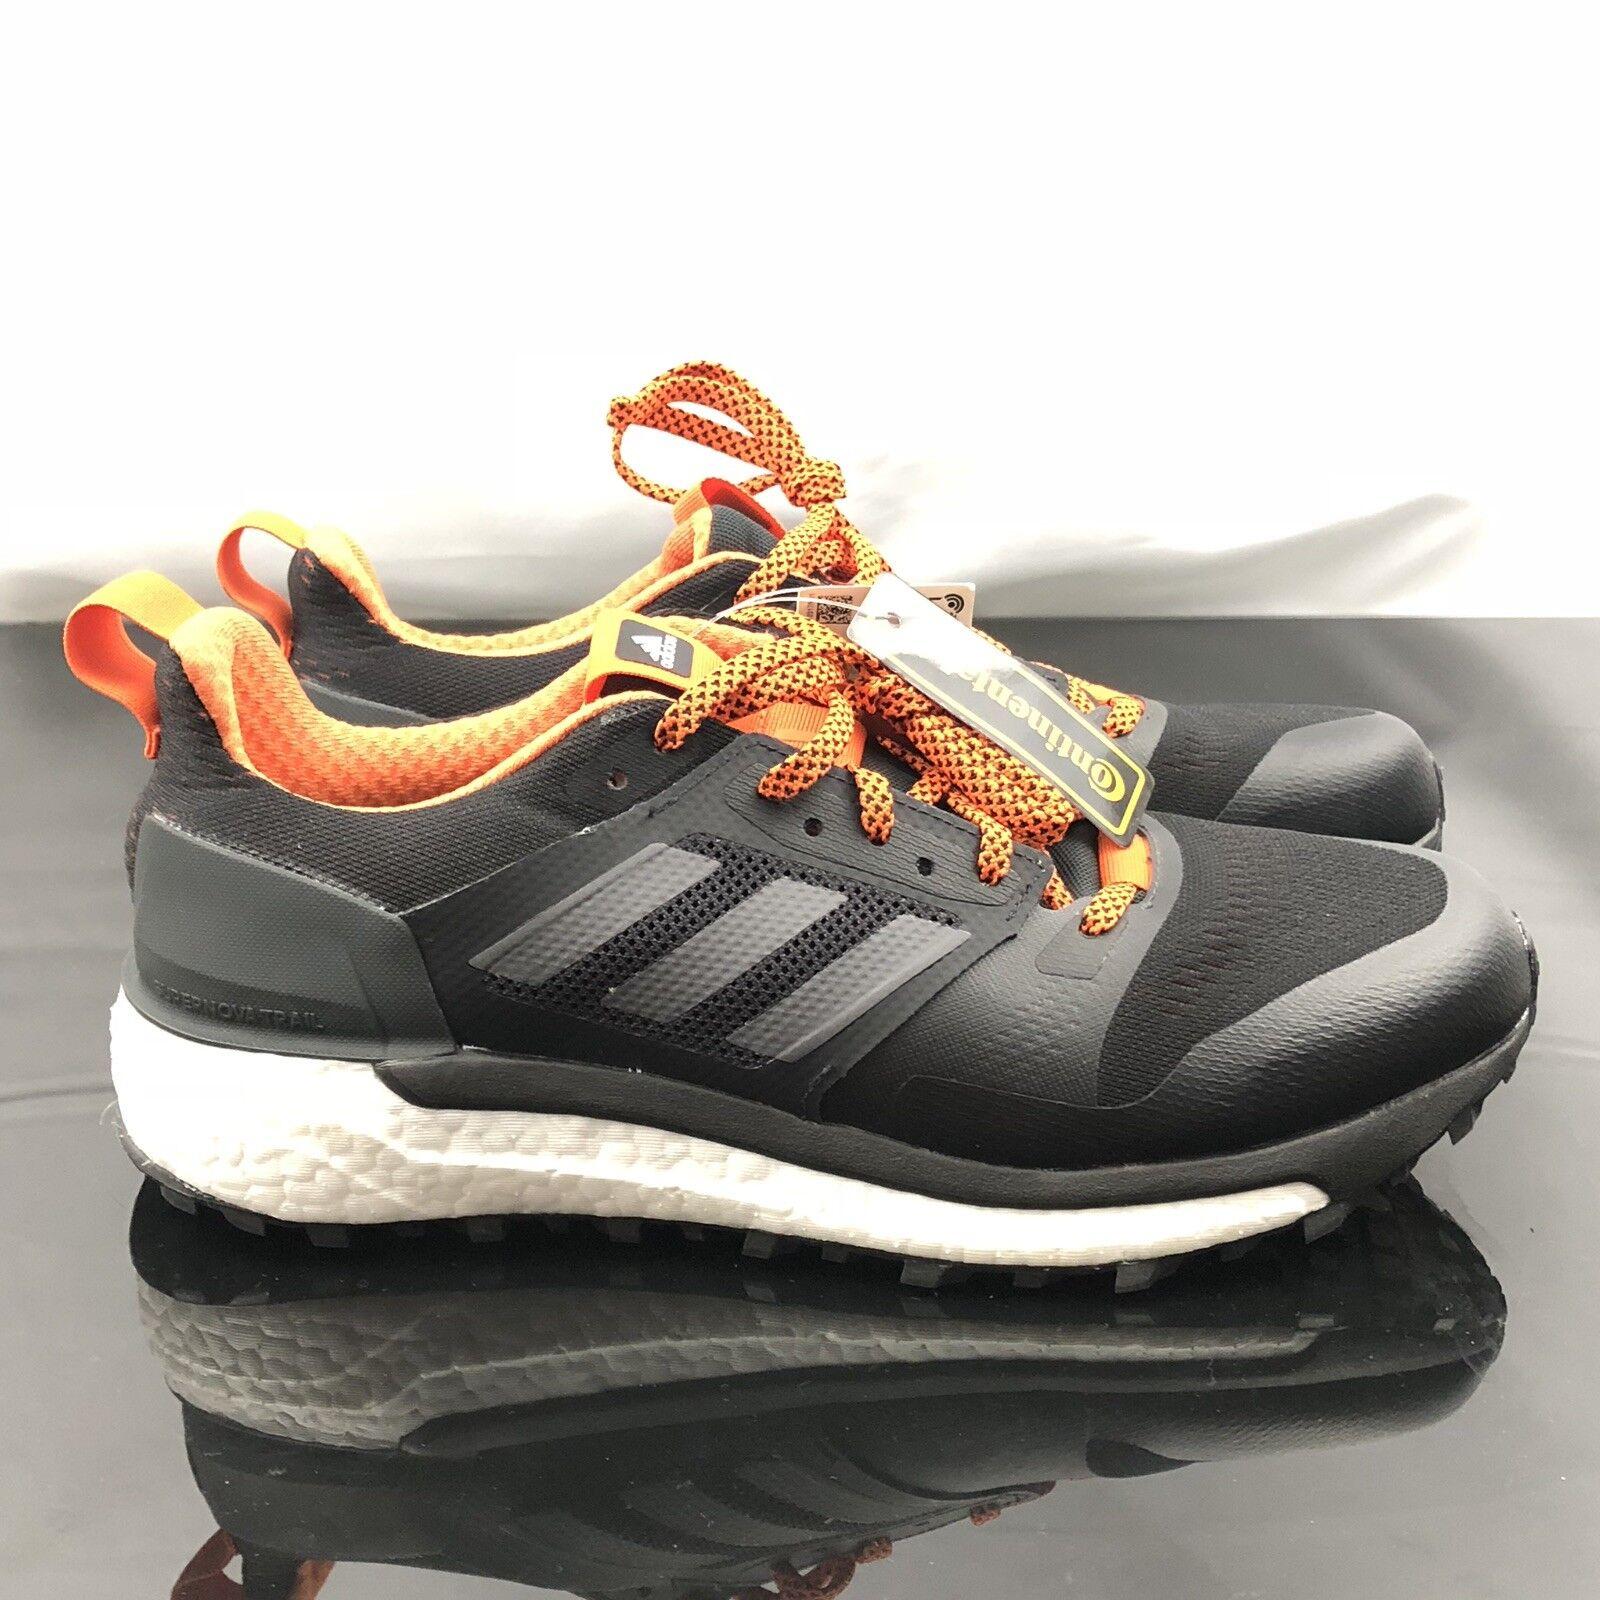 Adidas Supernova Trail Running Shoes Uomo Size 9.5 CG4025